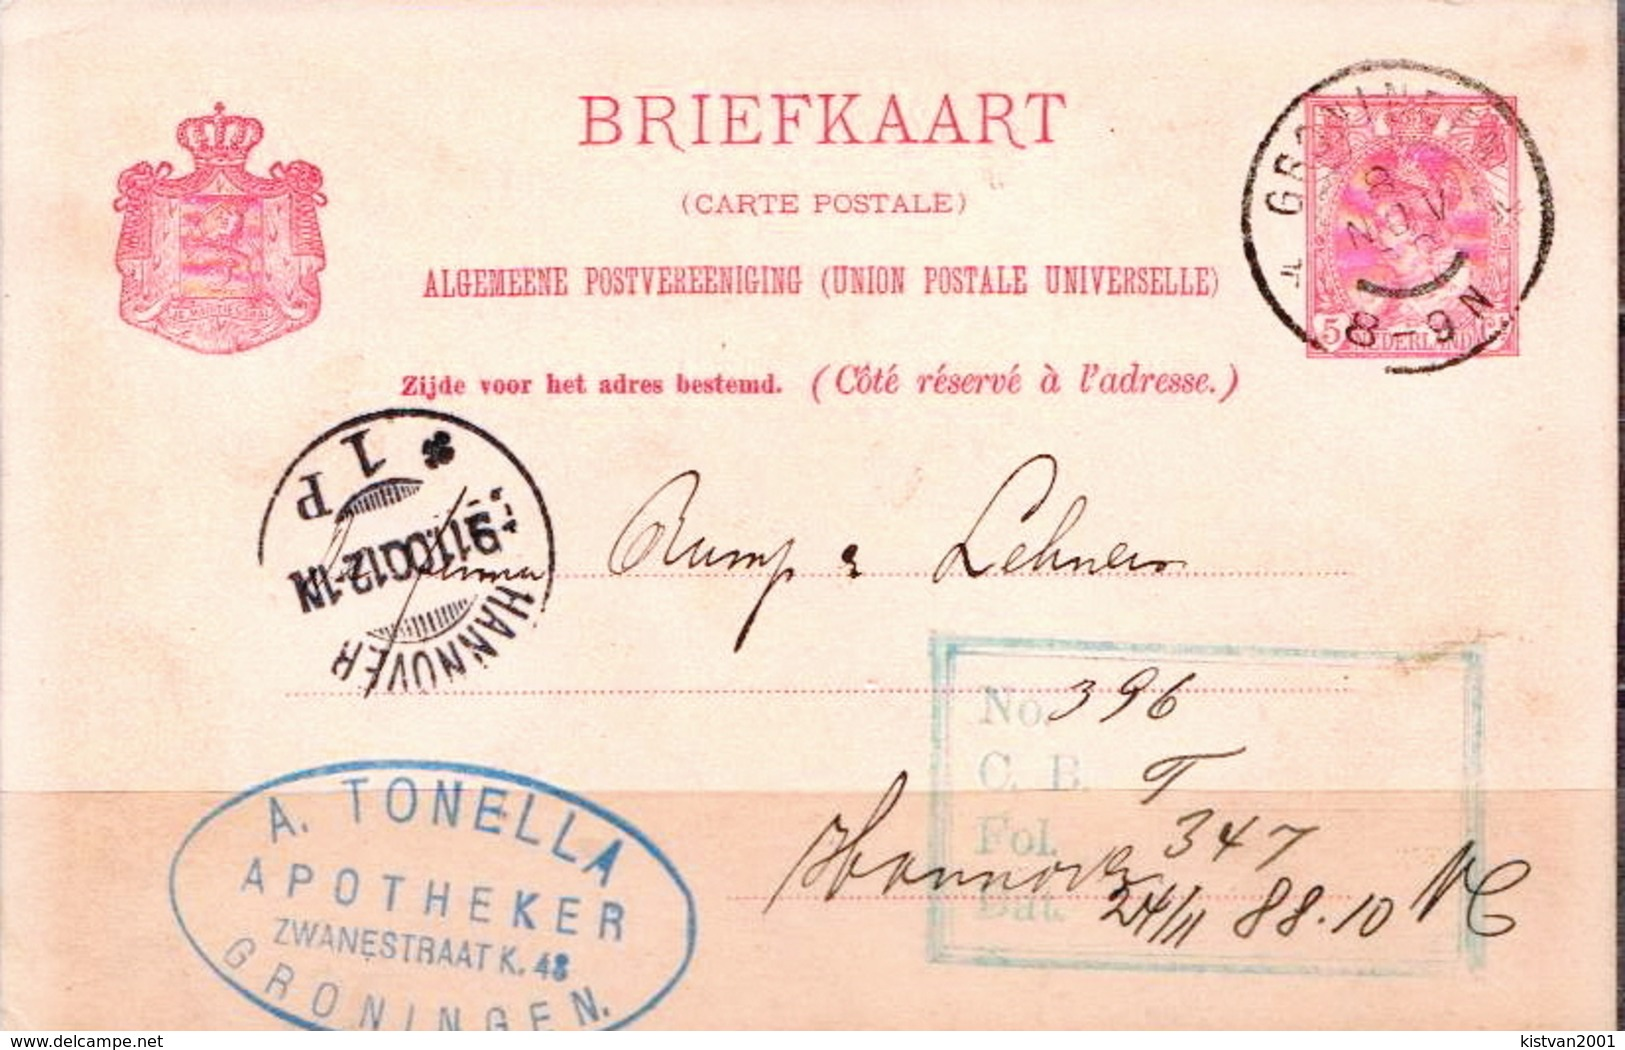 Postal History: Netherlands Postal Stationary From 1900 - Postal Stationery